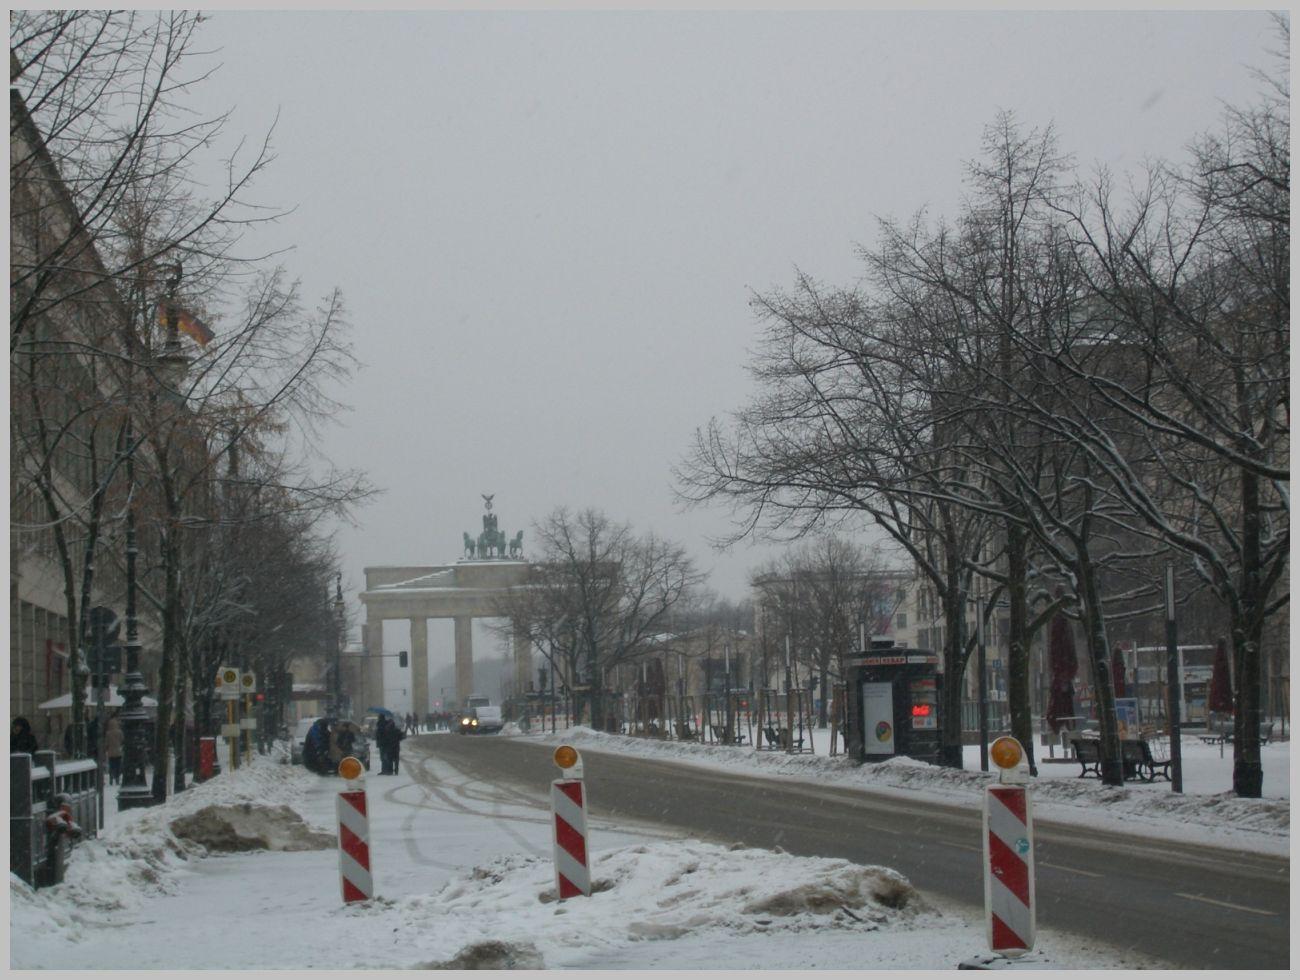 201101_Berlin001